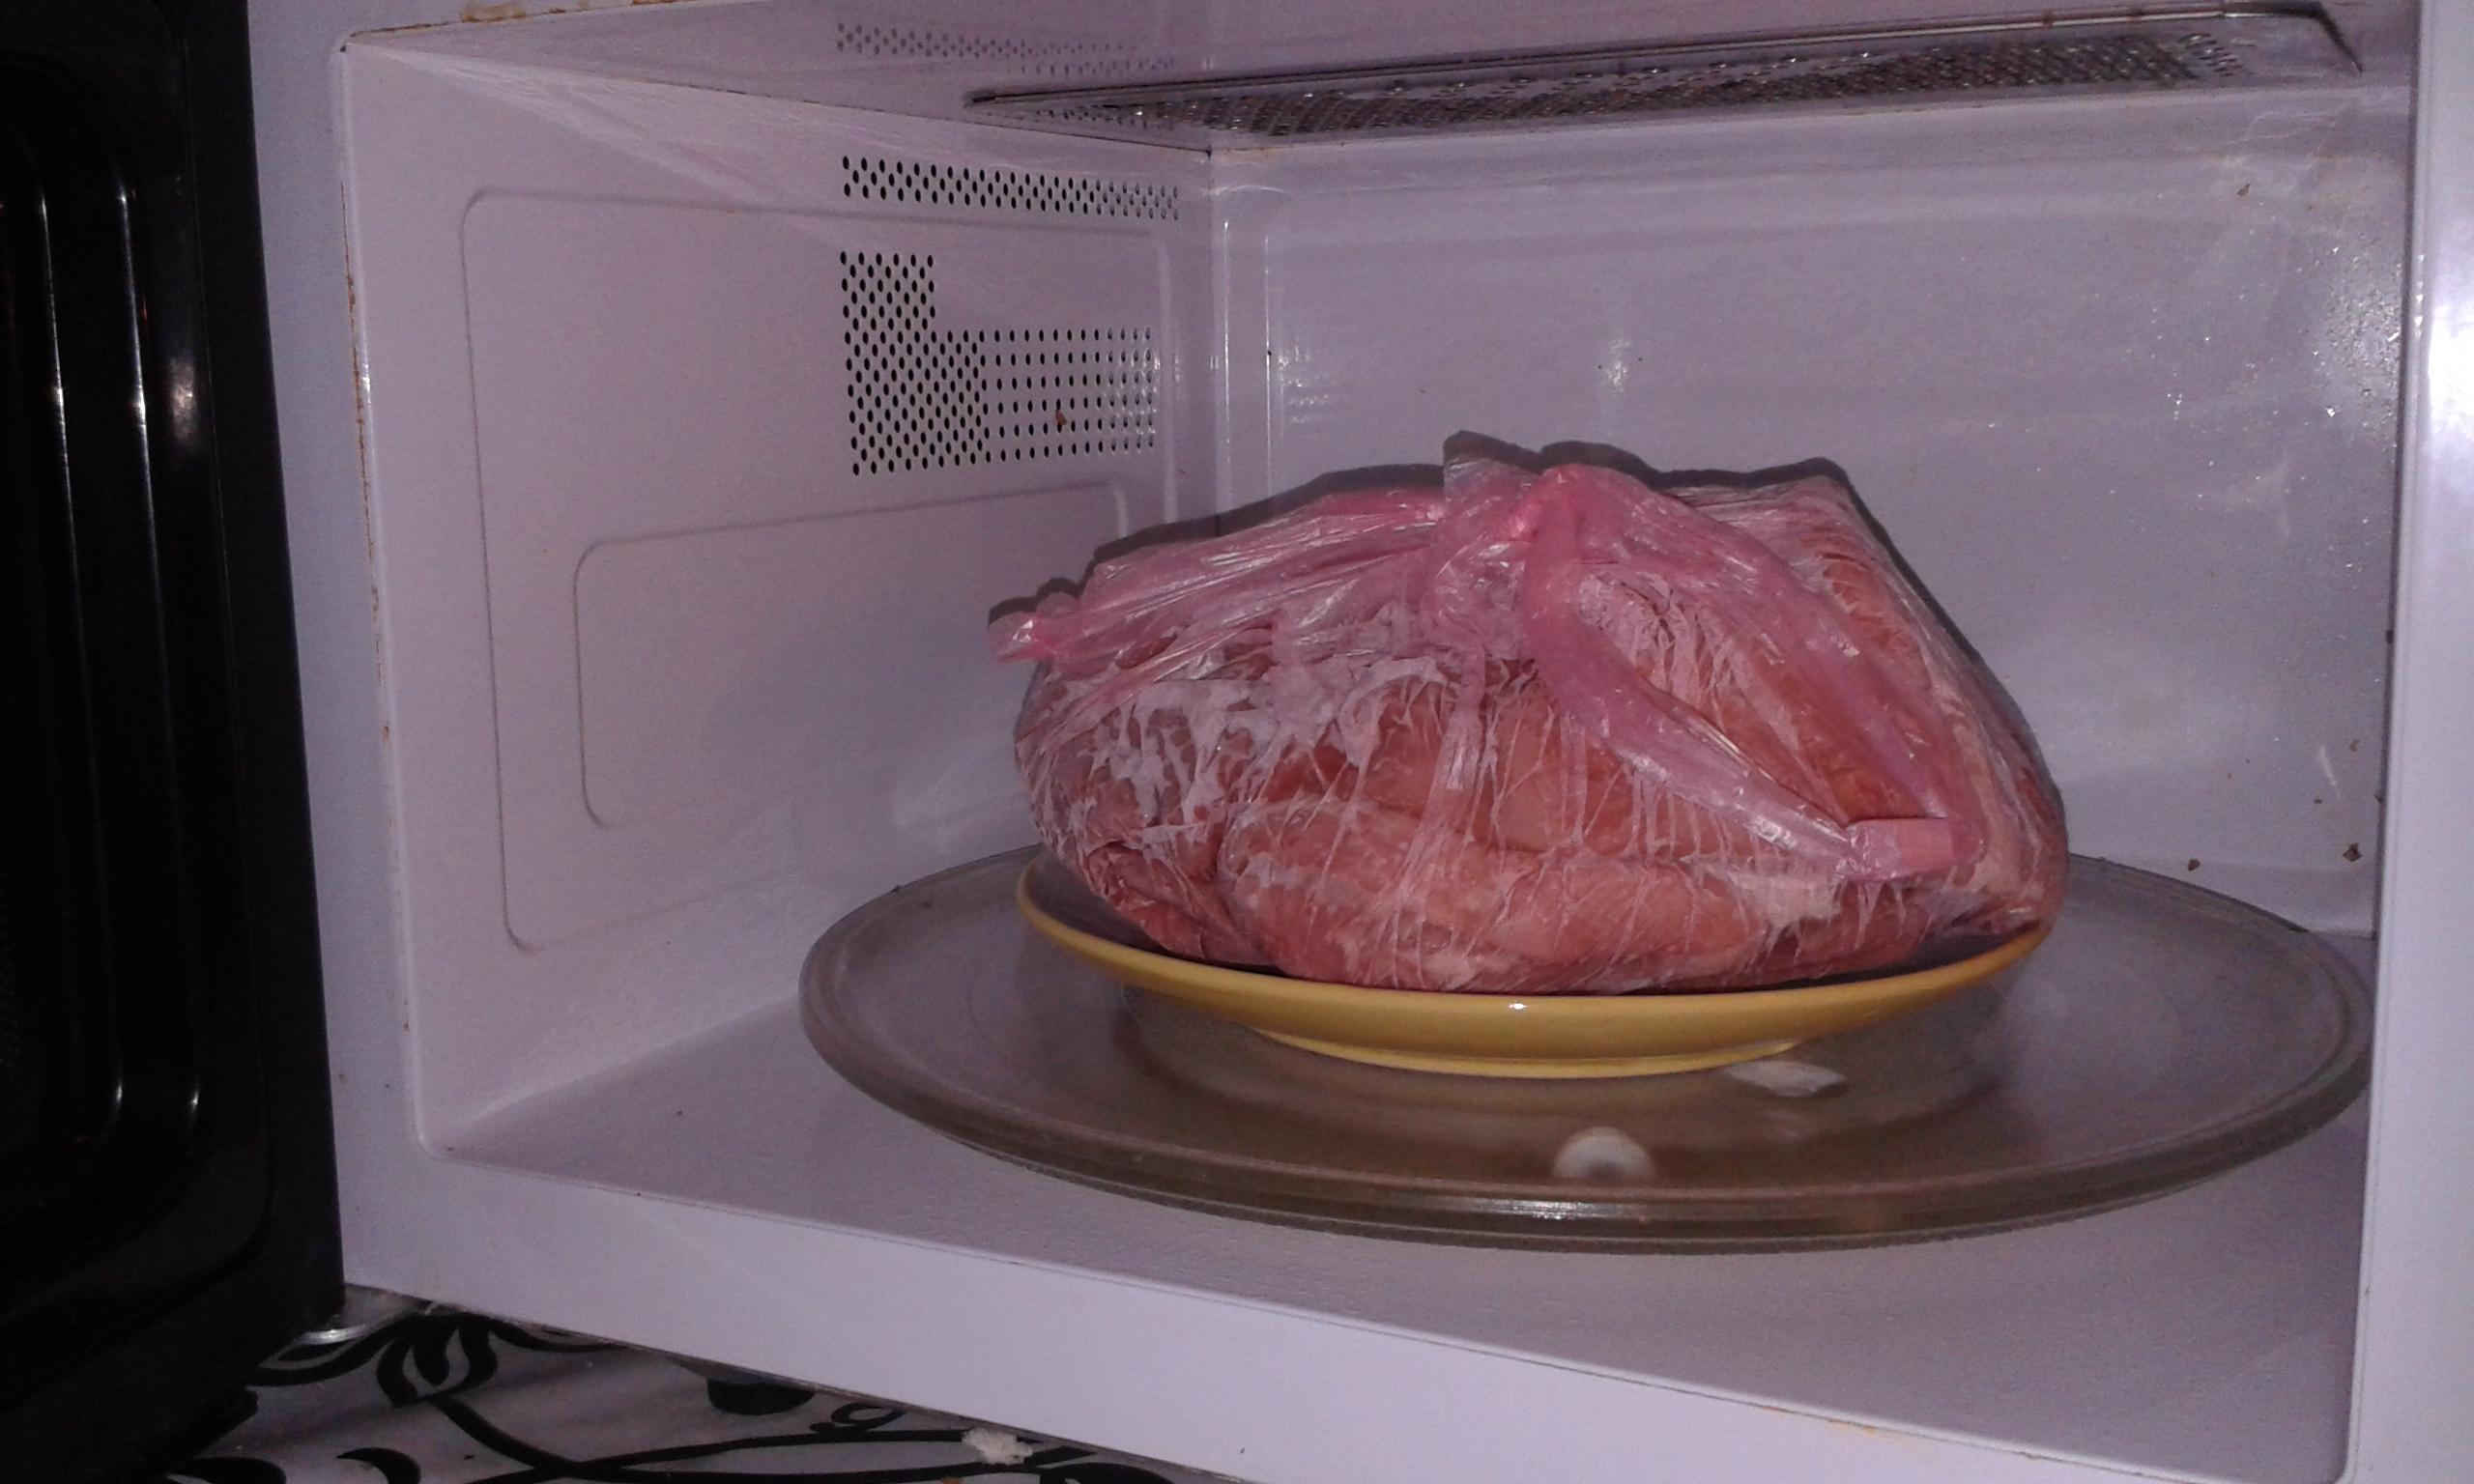 Мясо из морозилки